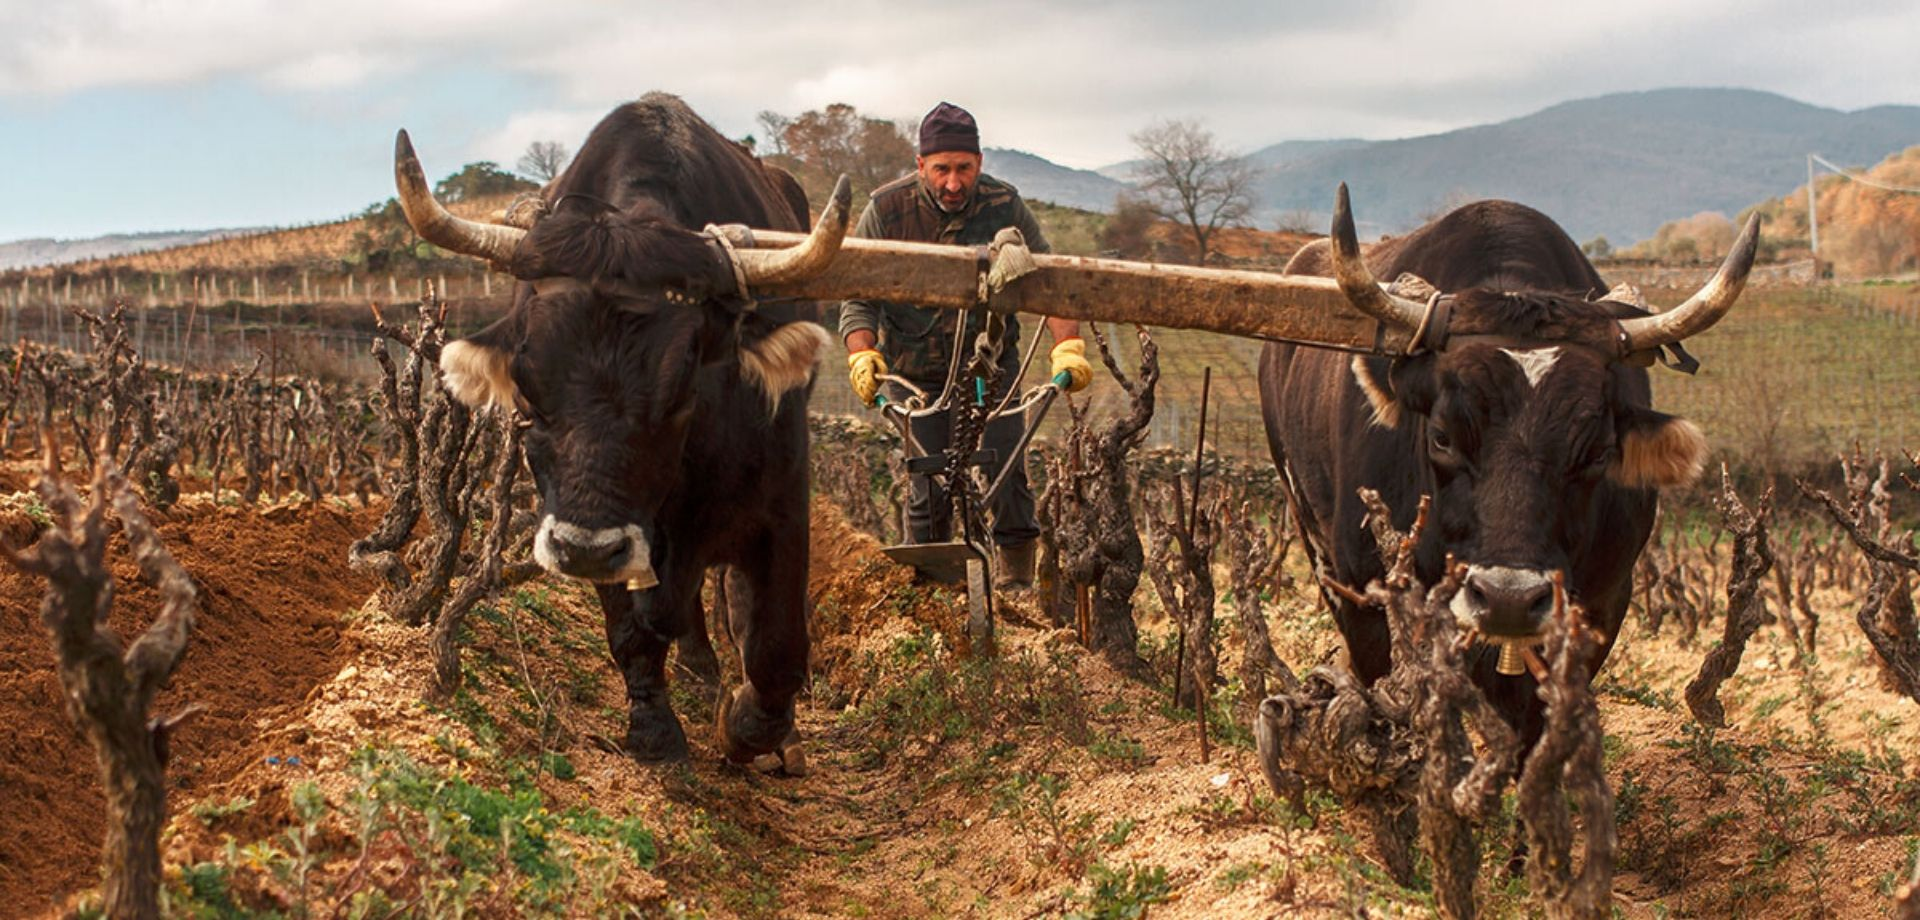 Tra i filari di uva Cannonau